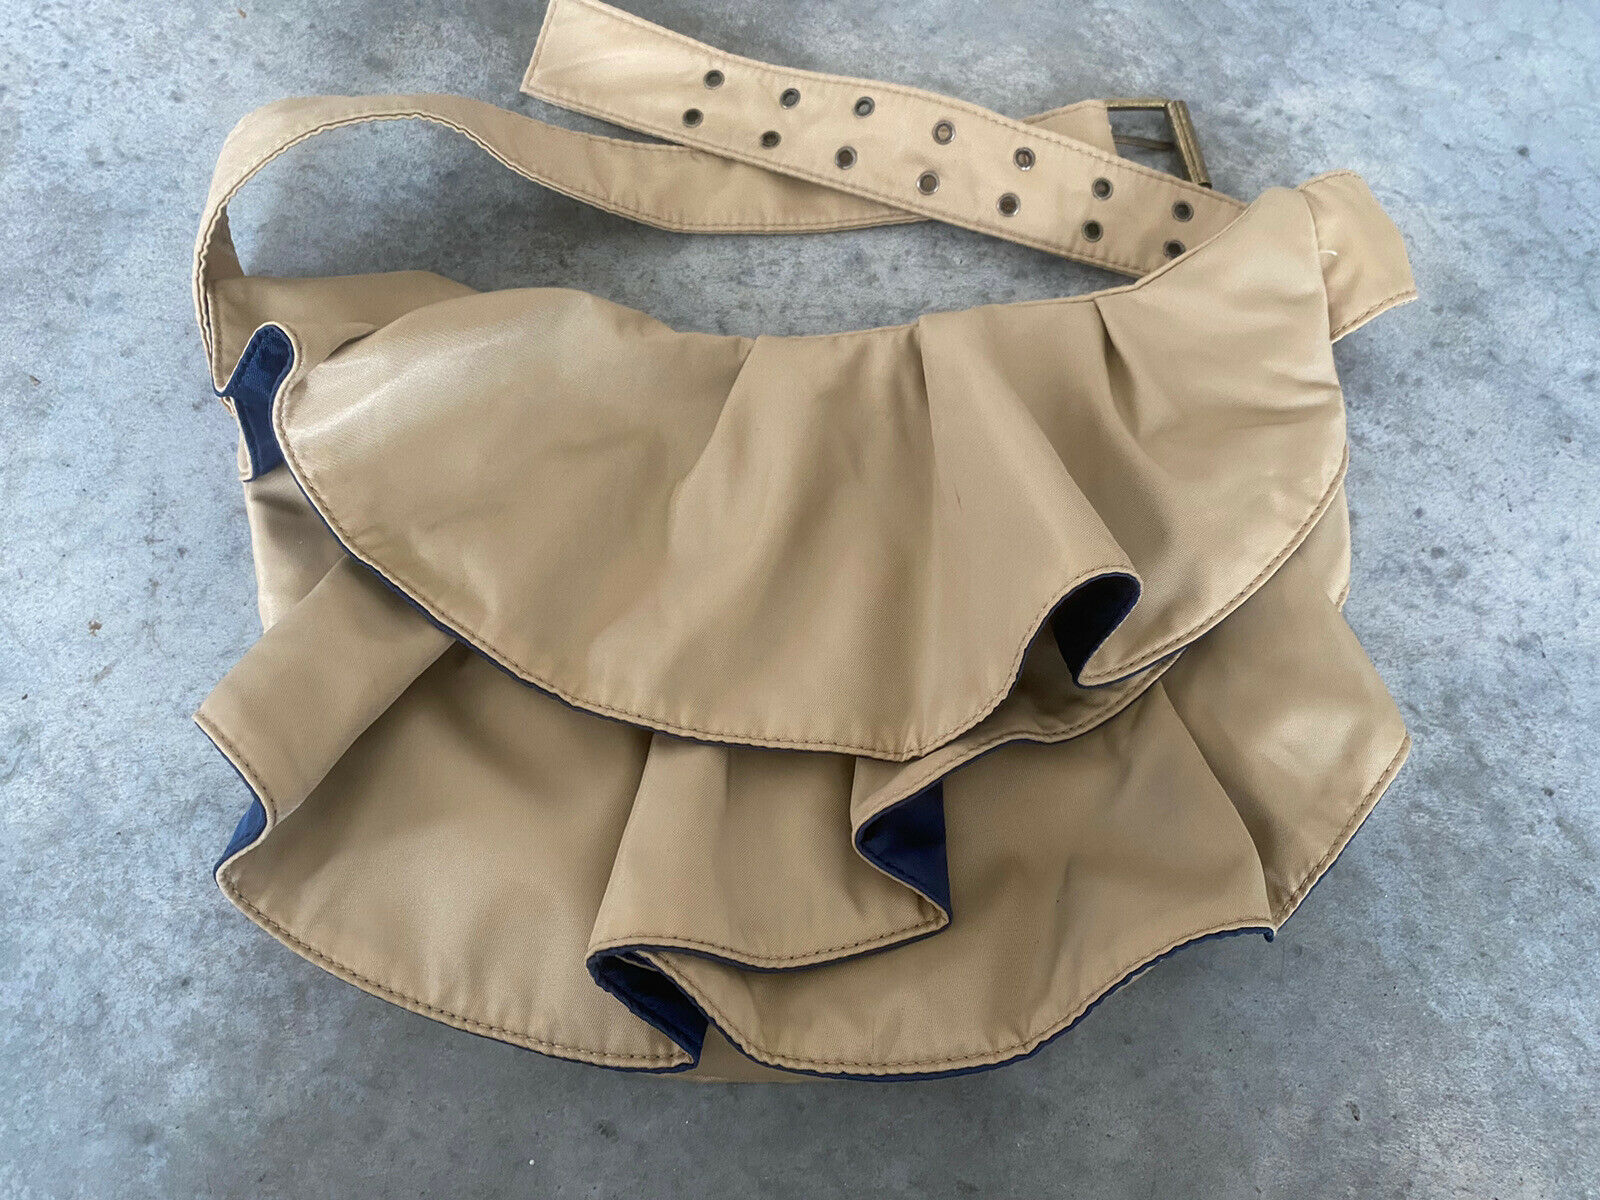 "Ruffle Nylon Beige Oatmeal Shoulder Bag Purse Dual Style 13"" x 10"""